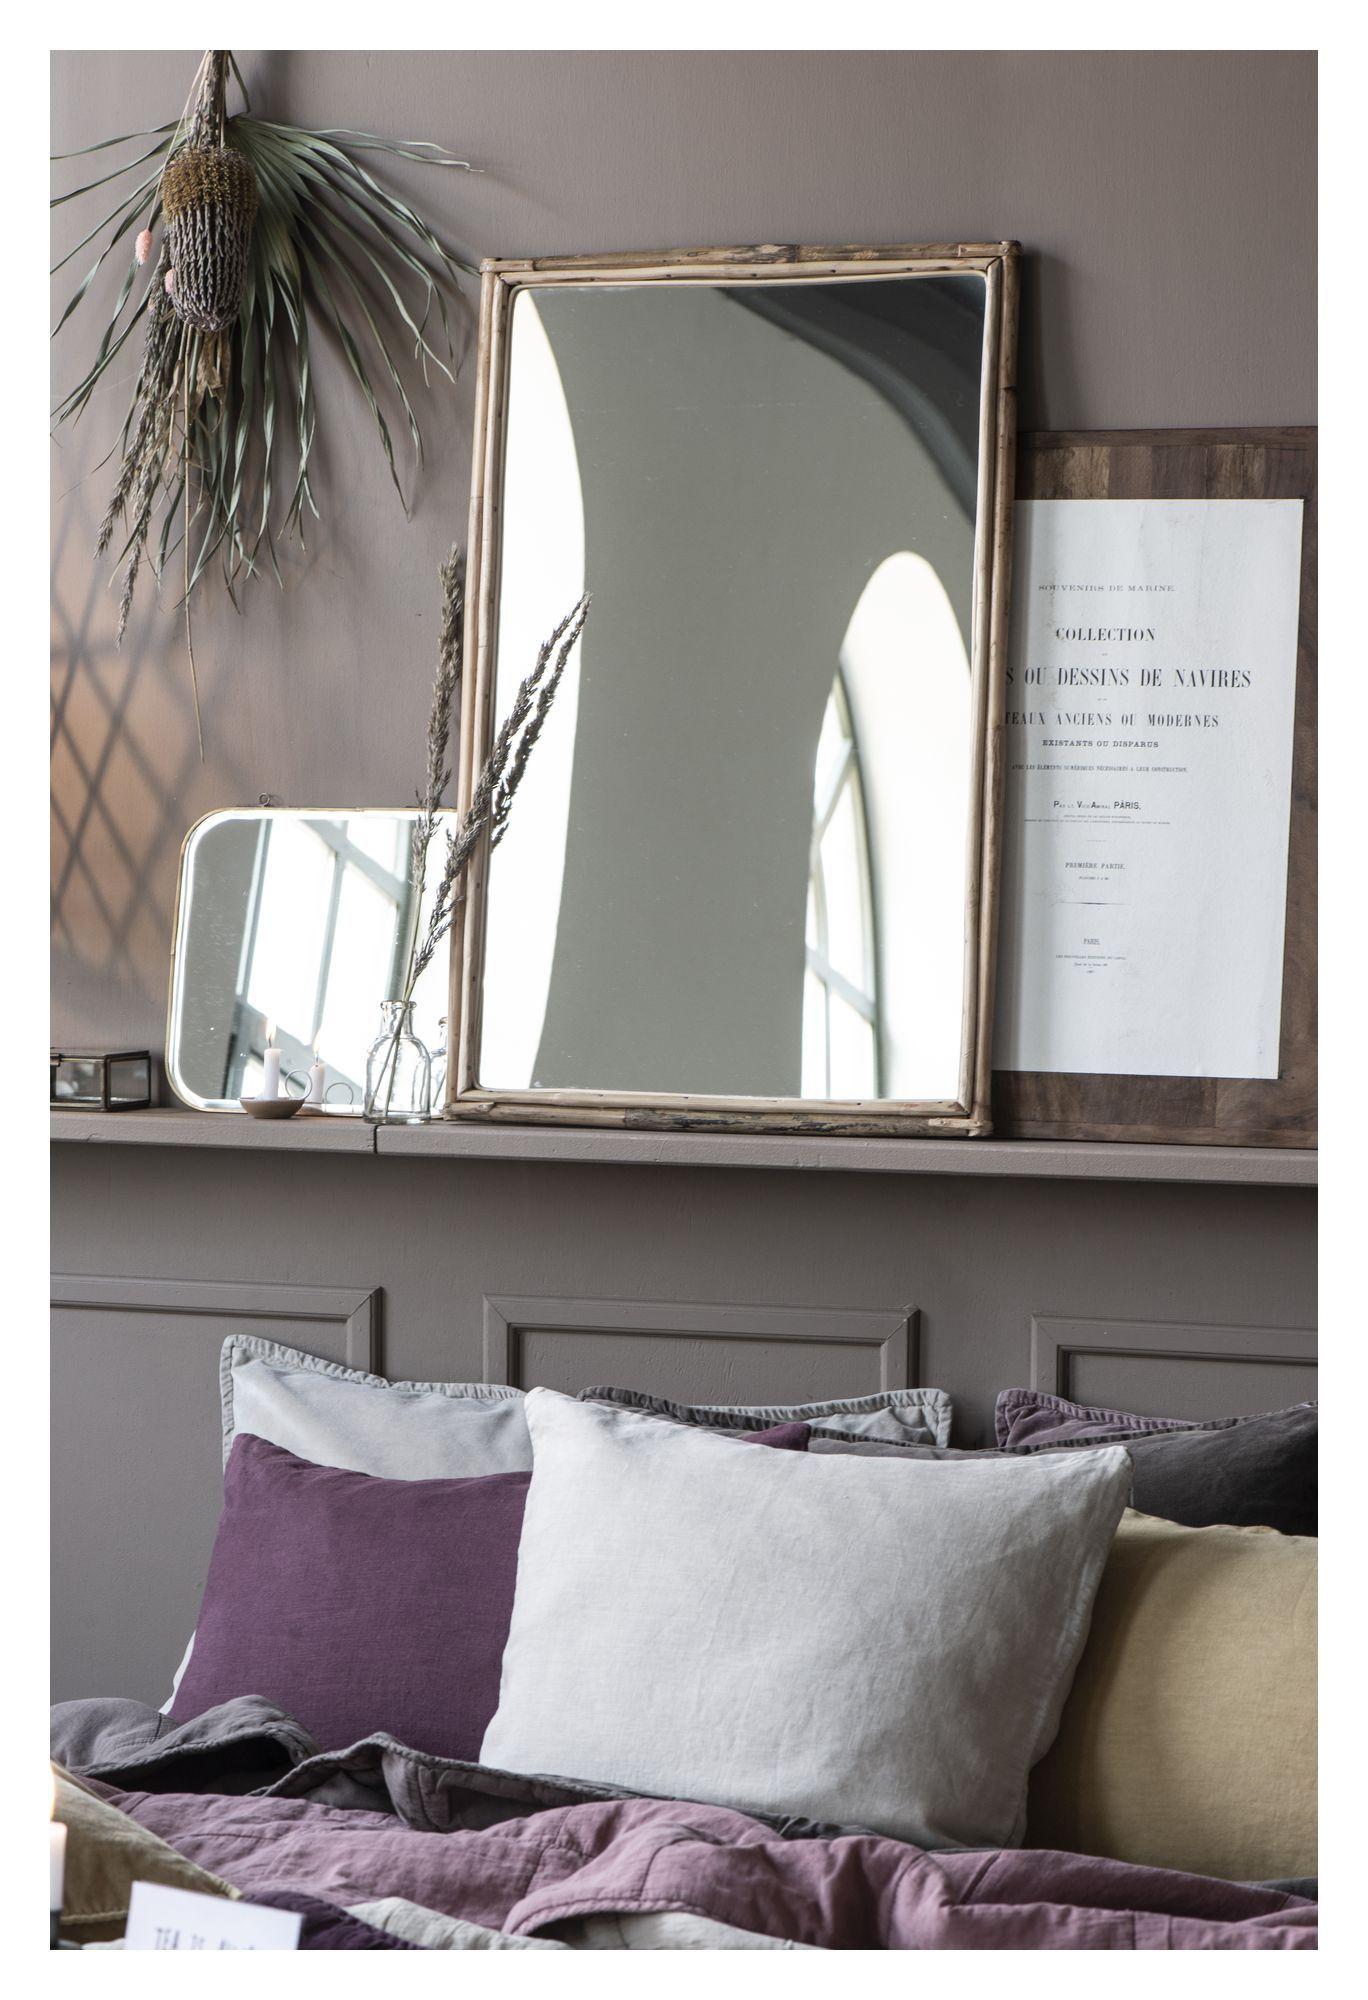 Ib Laursen Vægspejl m. bambuskant